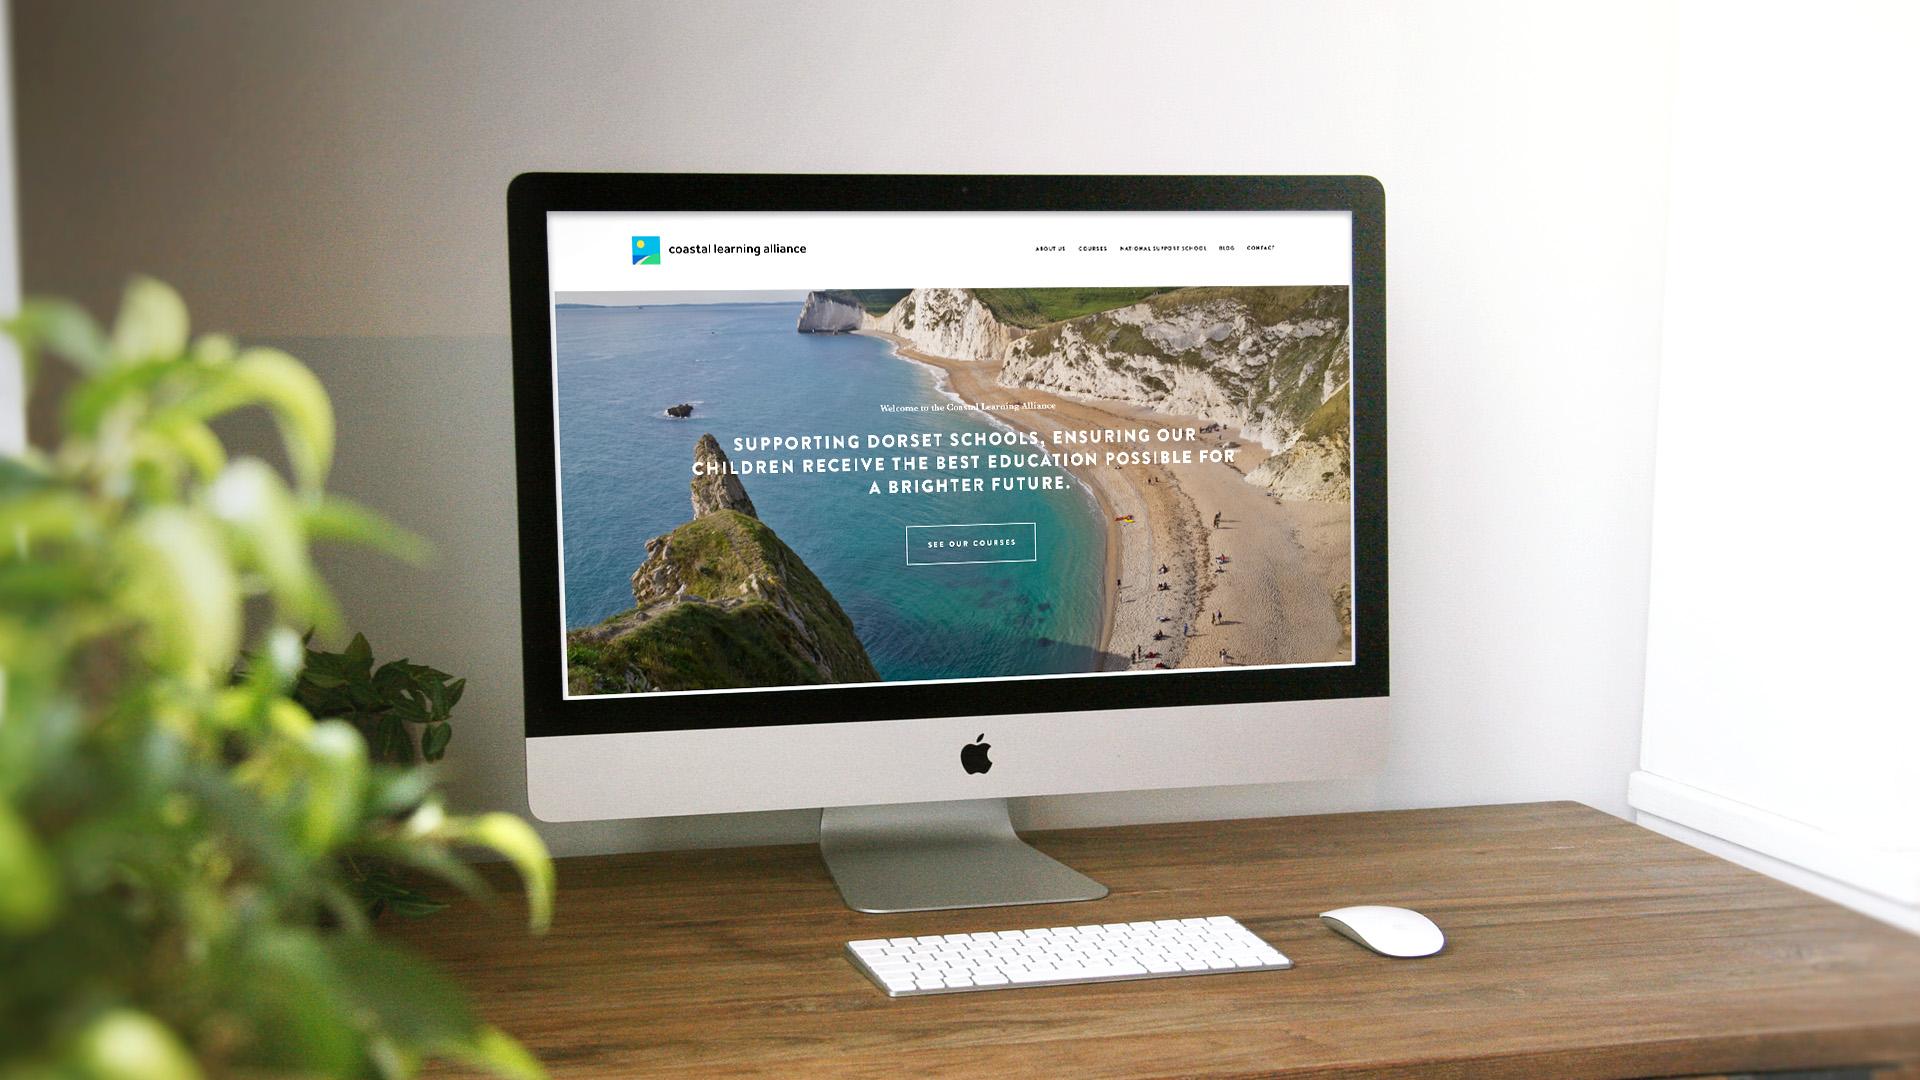 02-Lobo-Creative-Coastal-Learning-Alliance-website-digital-design-case-study.jpg